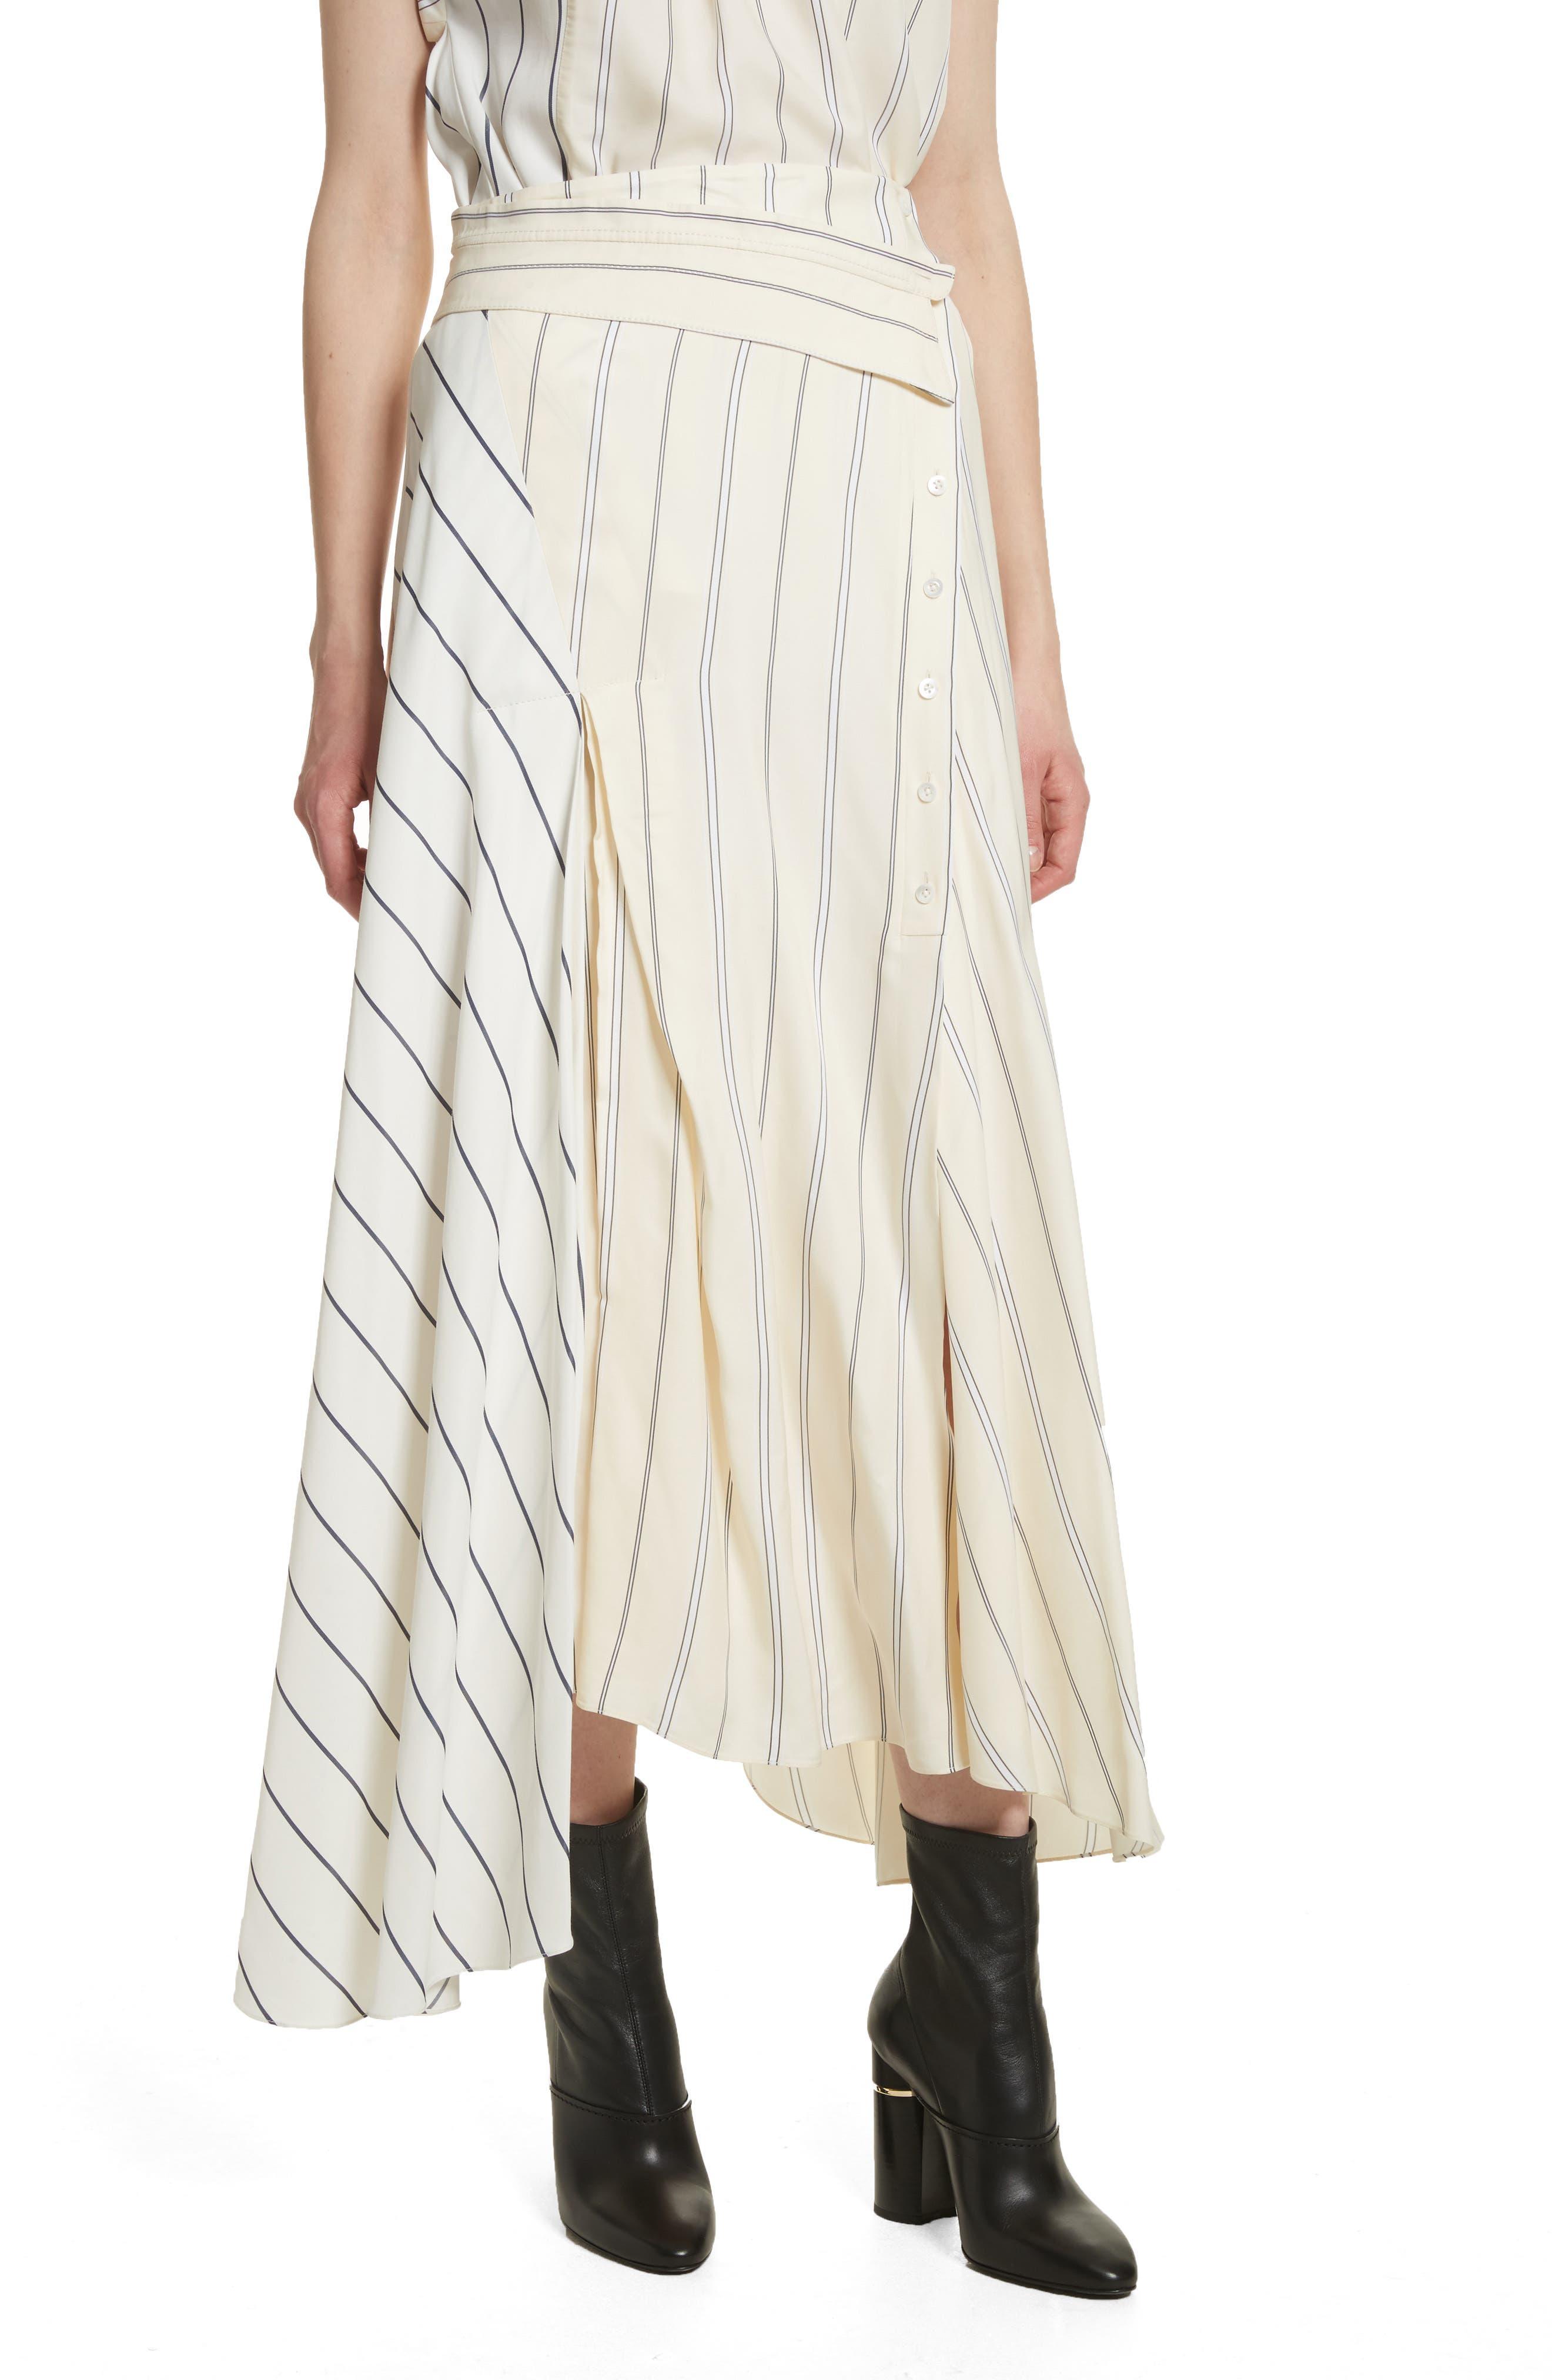 3.1 Phillip Lim Mixed Stripe Asymmetrical Skirt